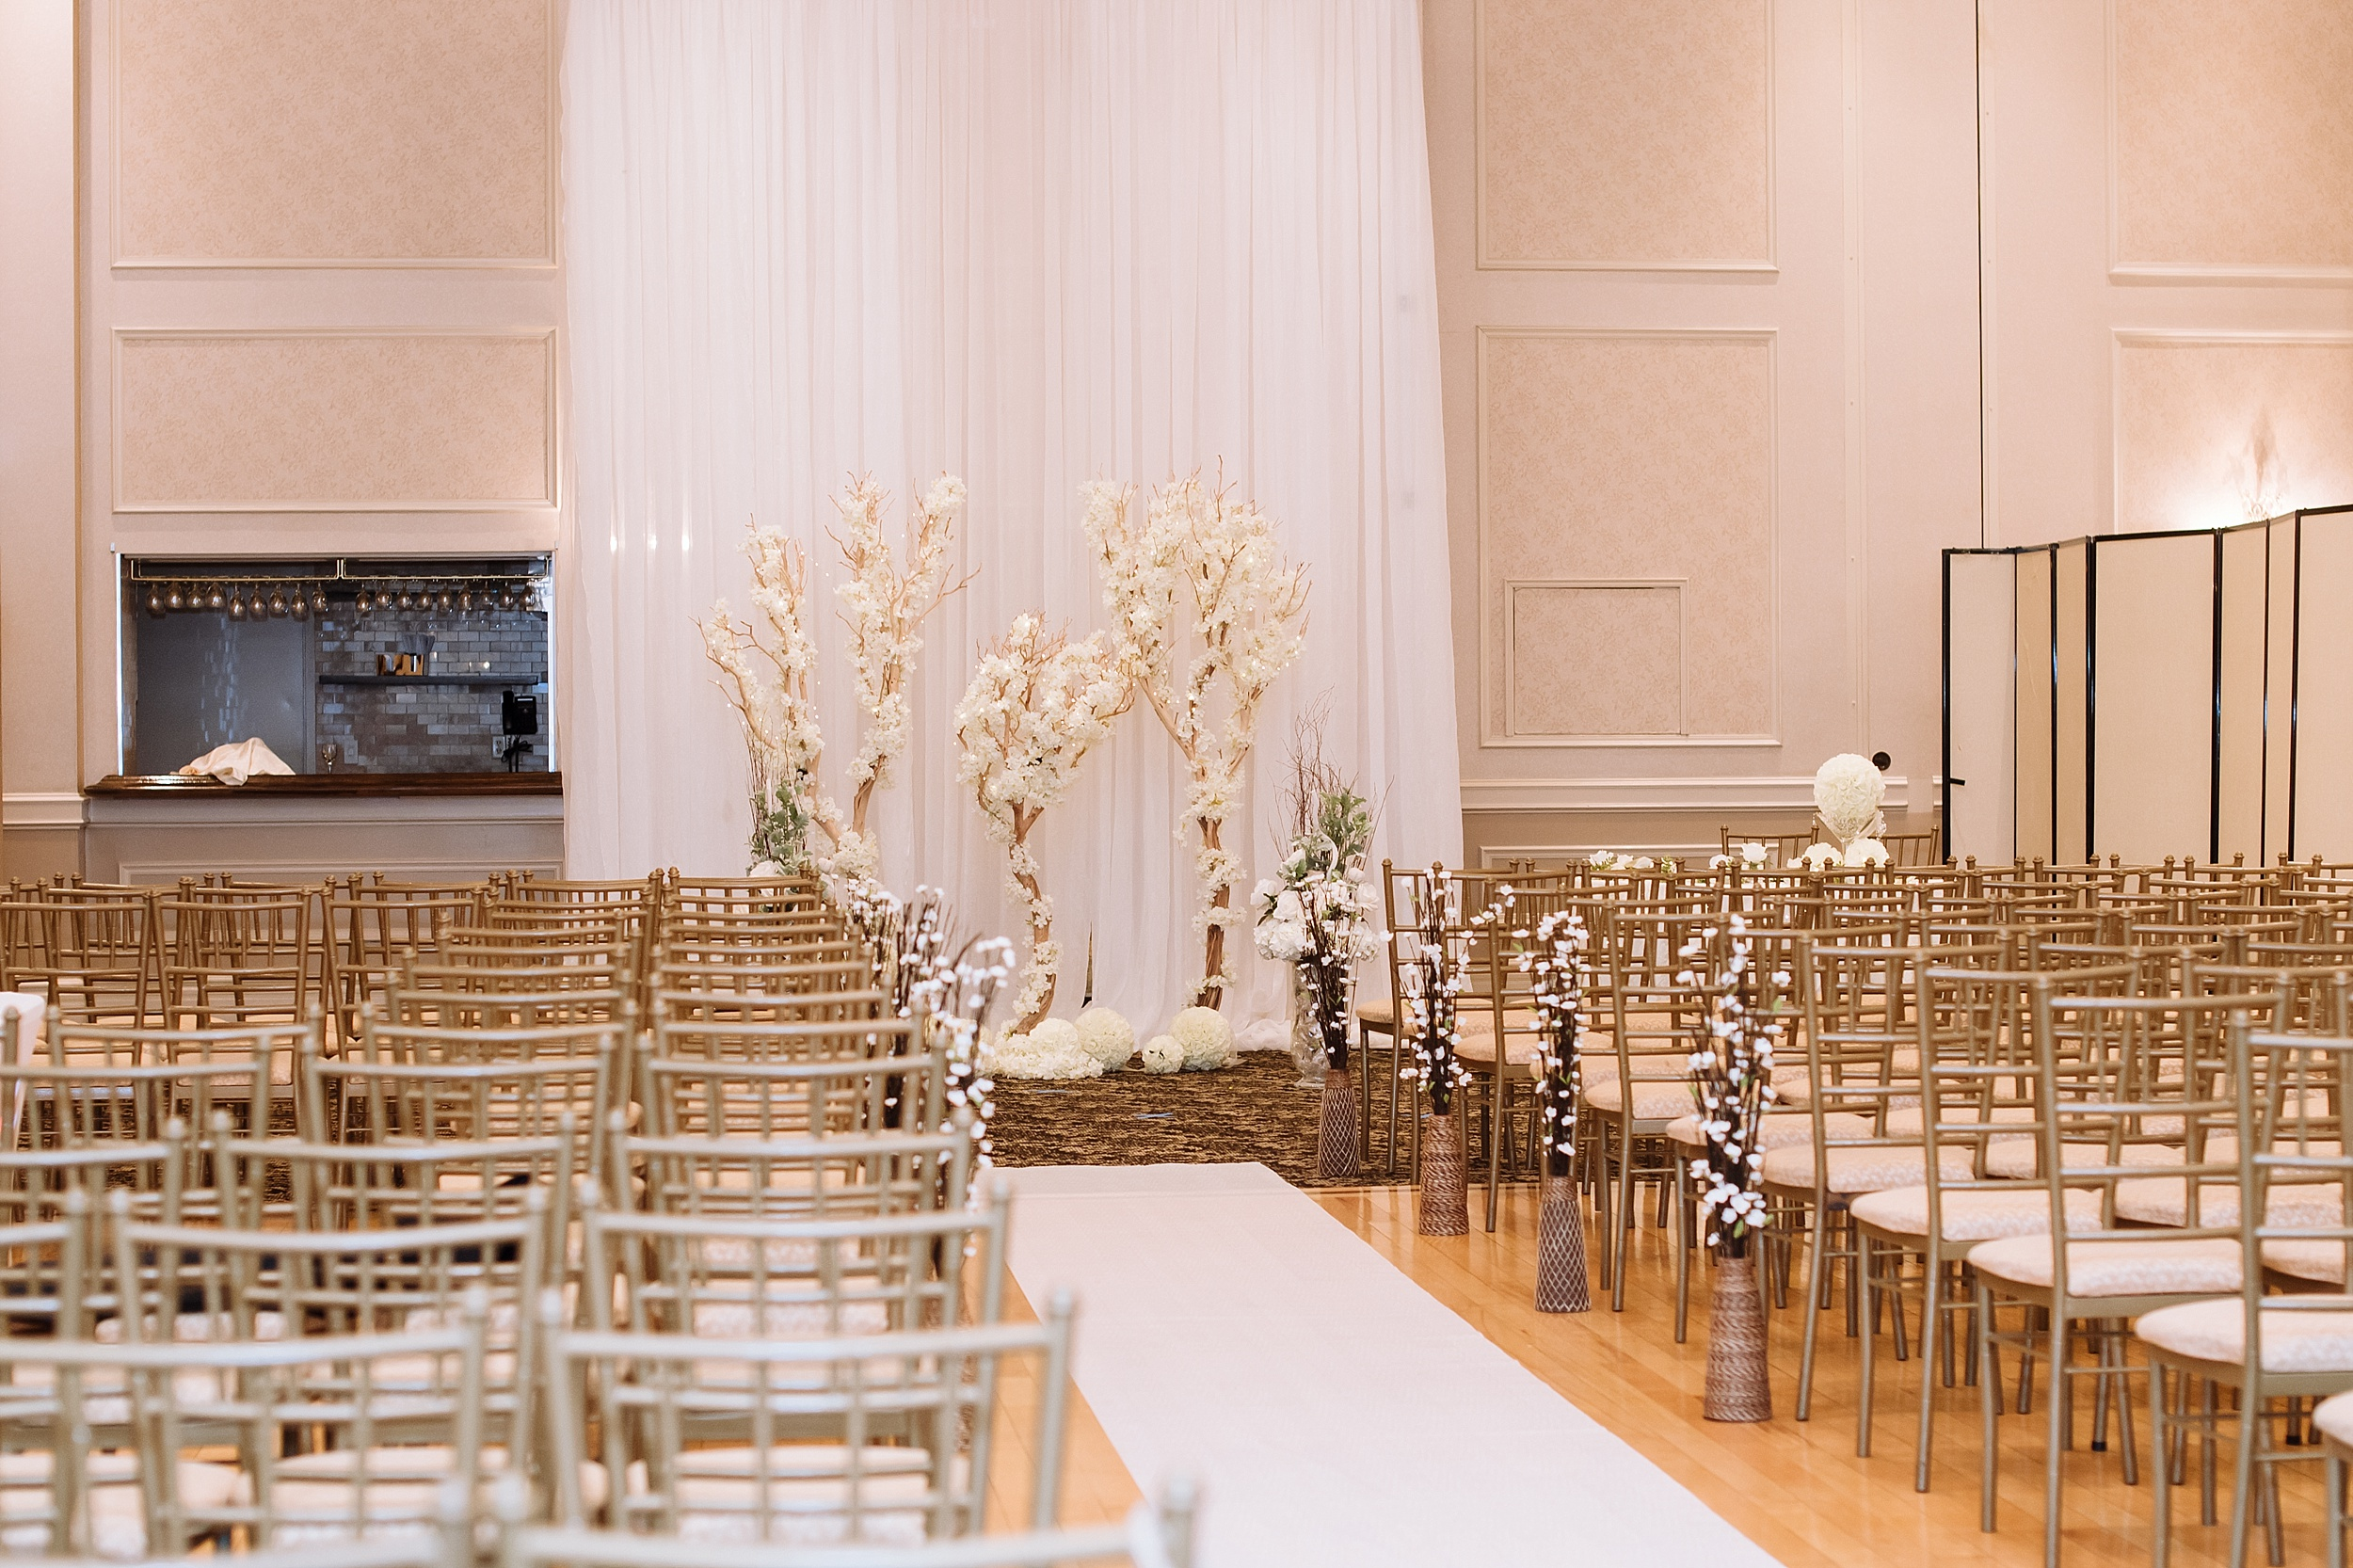 McMichael_Art_Collection_Wedding_chateau_le_jardin_Justine_Munro_Toronto_Photographer046.jpg